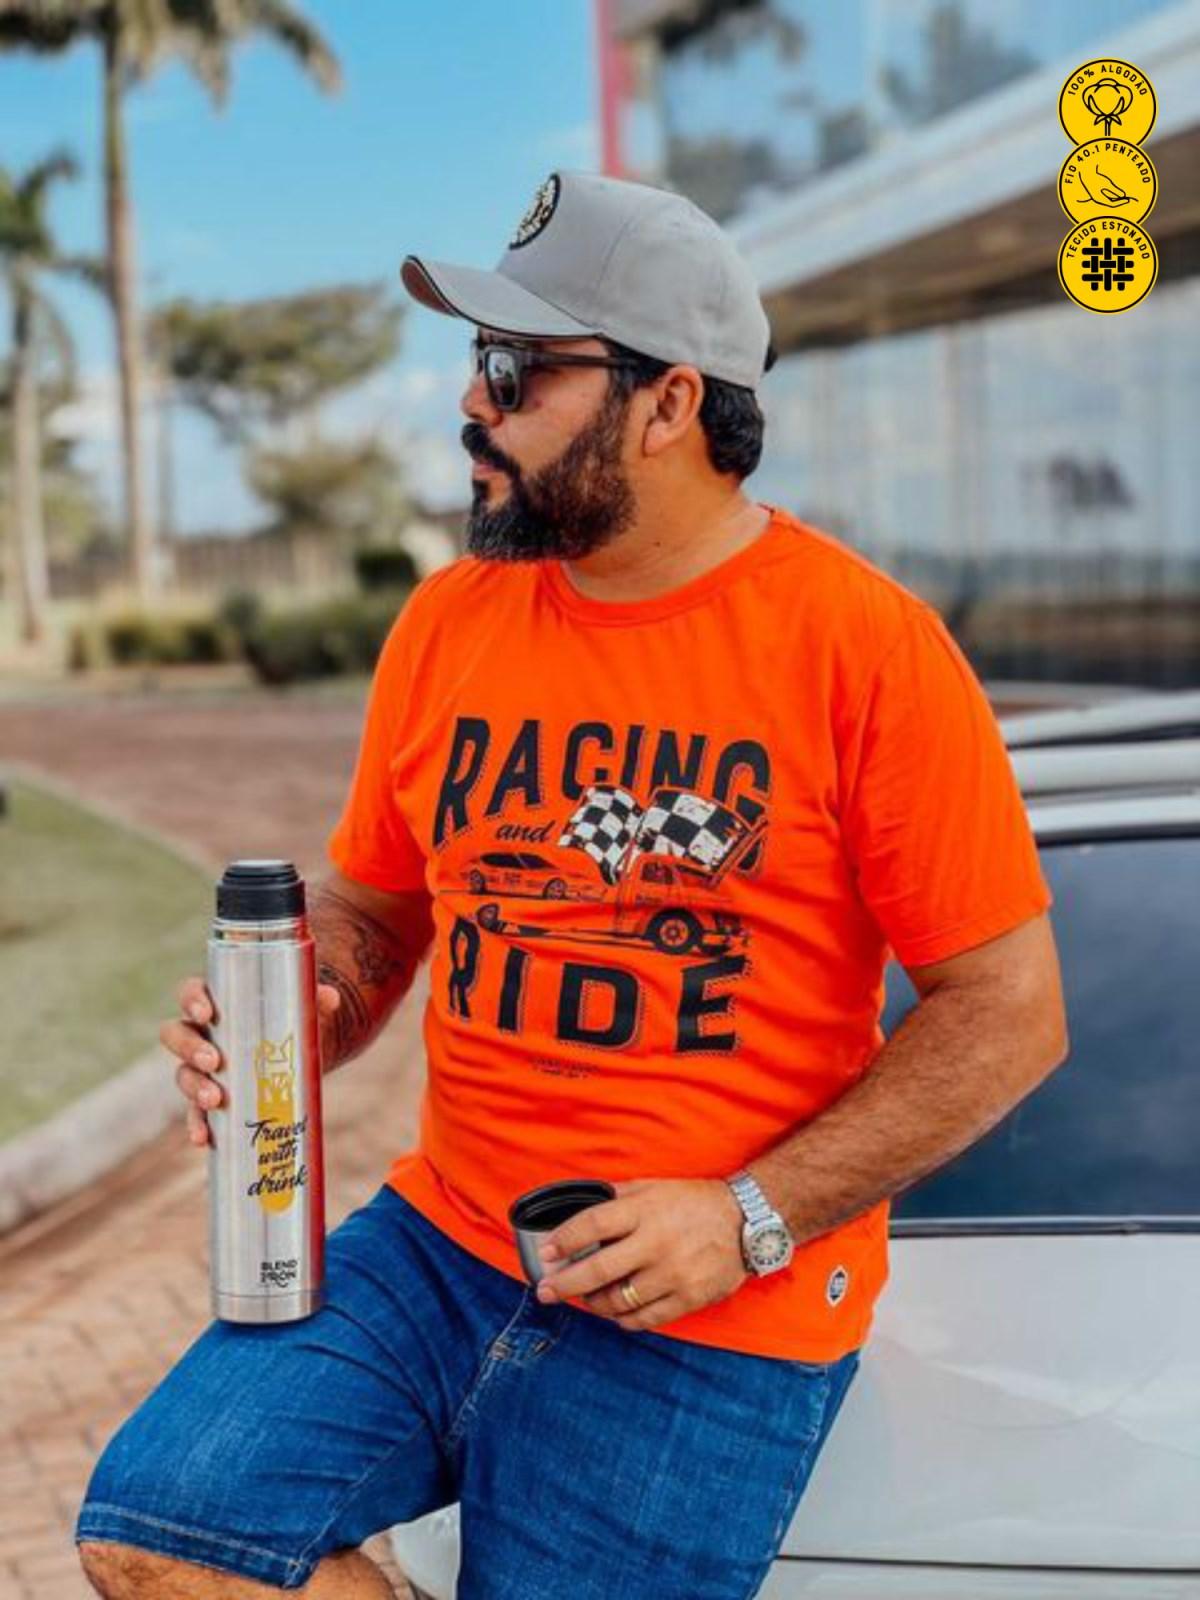 Camiseta Masculina - Racing and Ride | Blend Iron